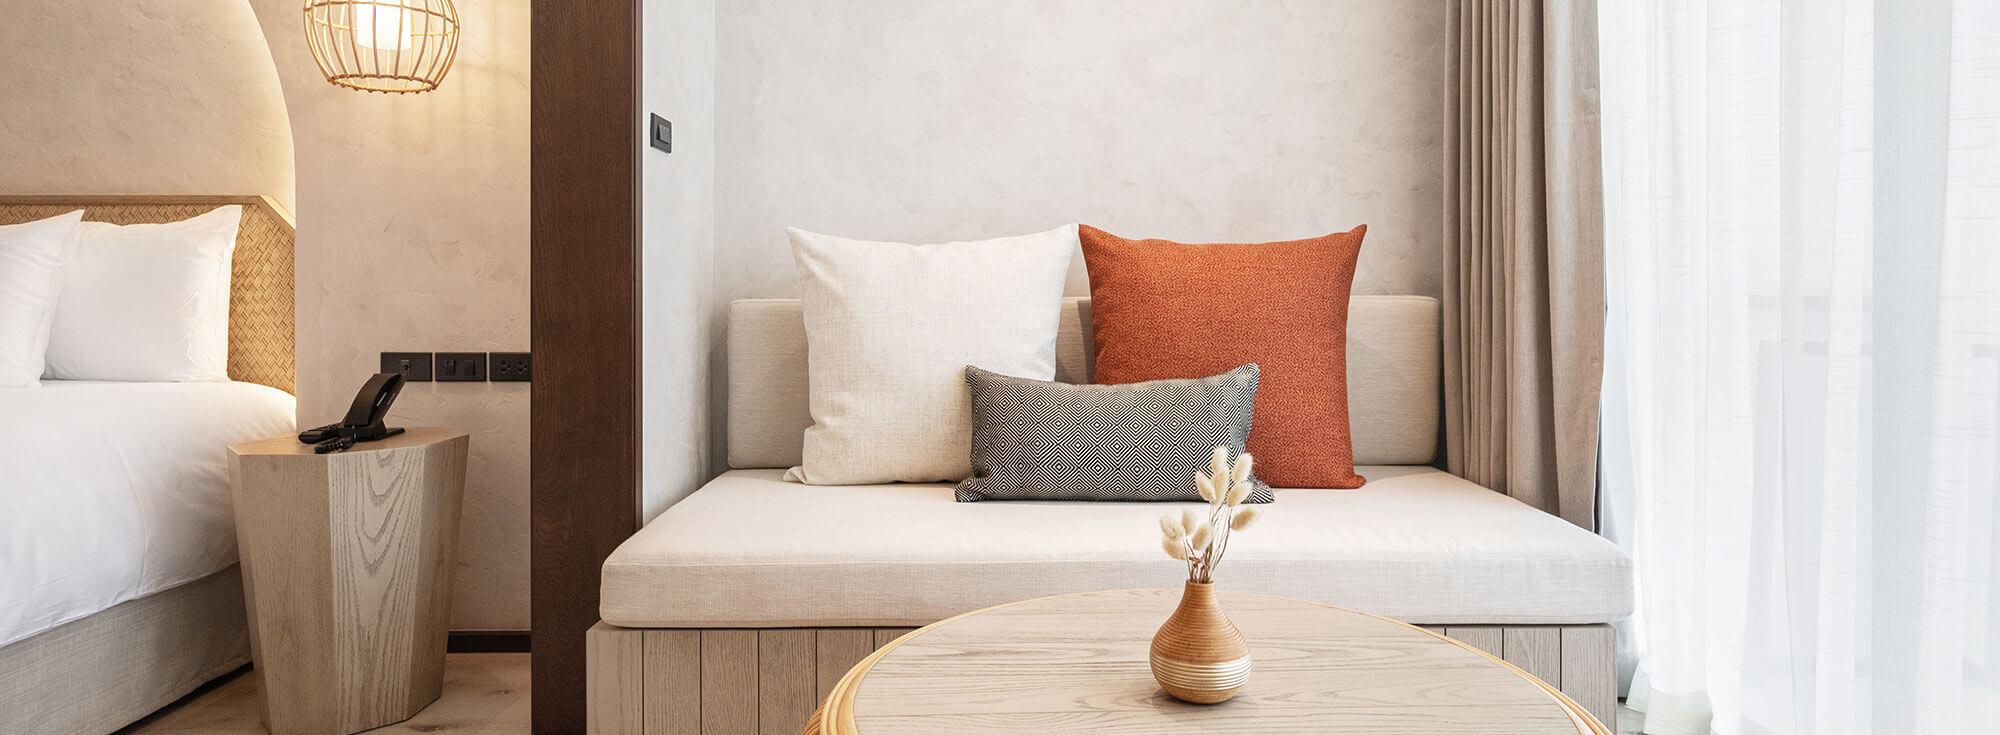 Living space designed